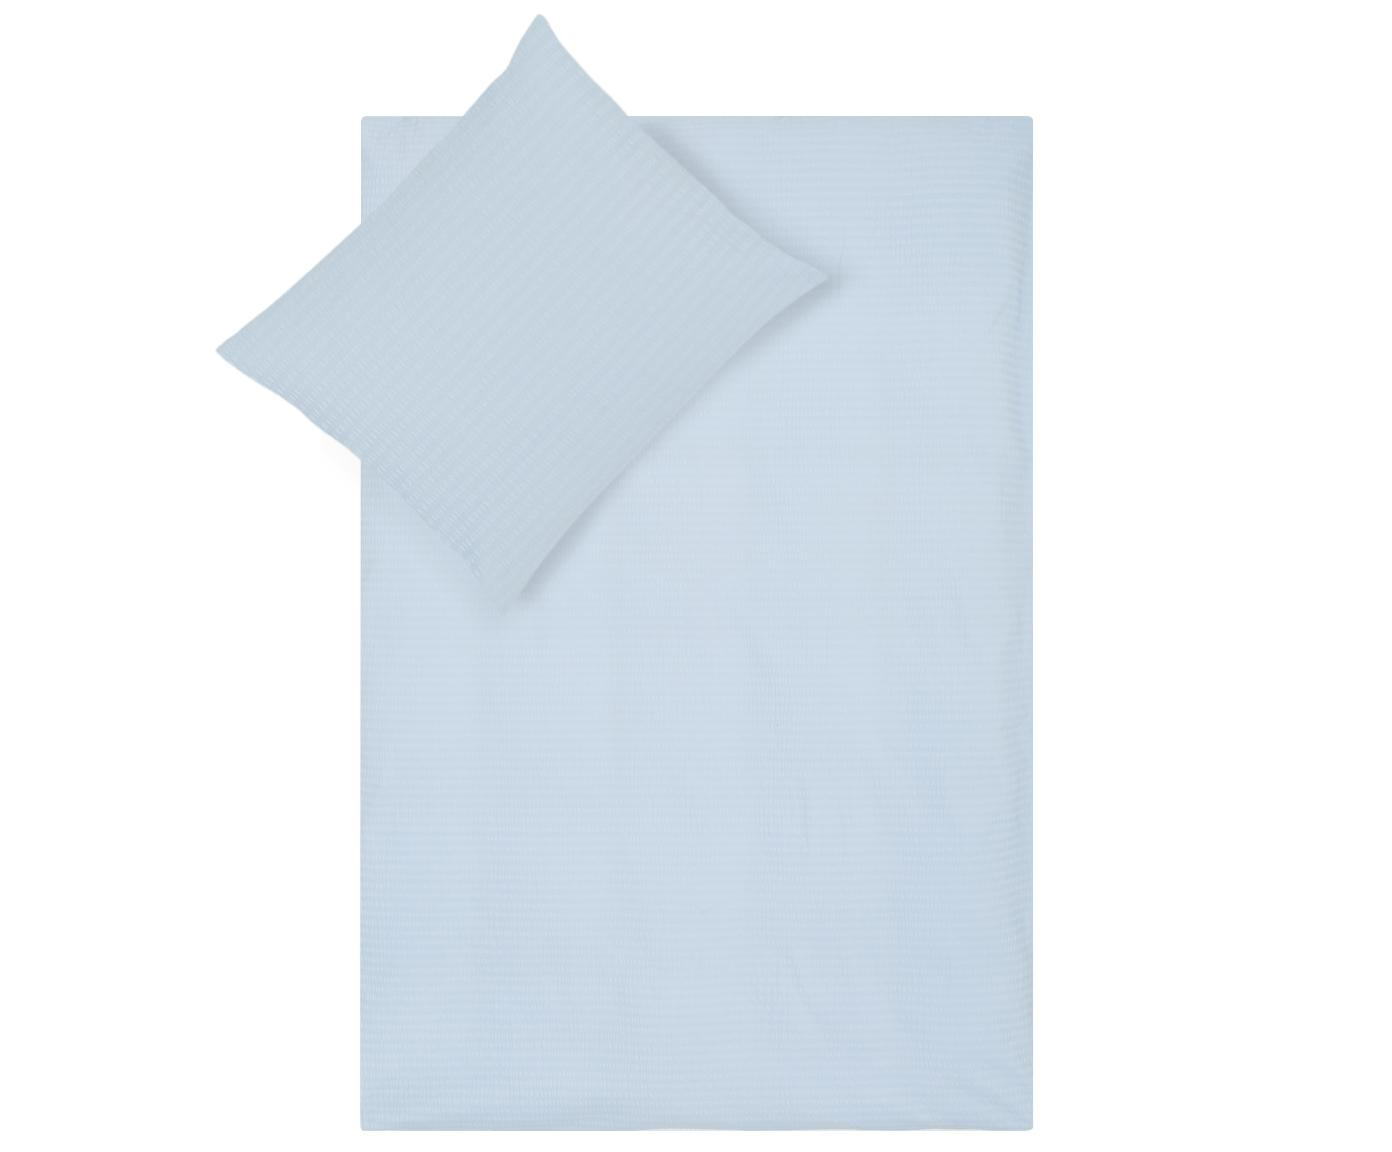 Seersucker dekbedovertrek Illusion, Katoen, Lichtblauw, 140 x 220 cm